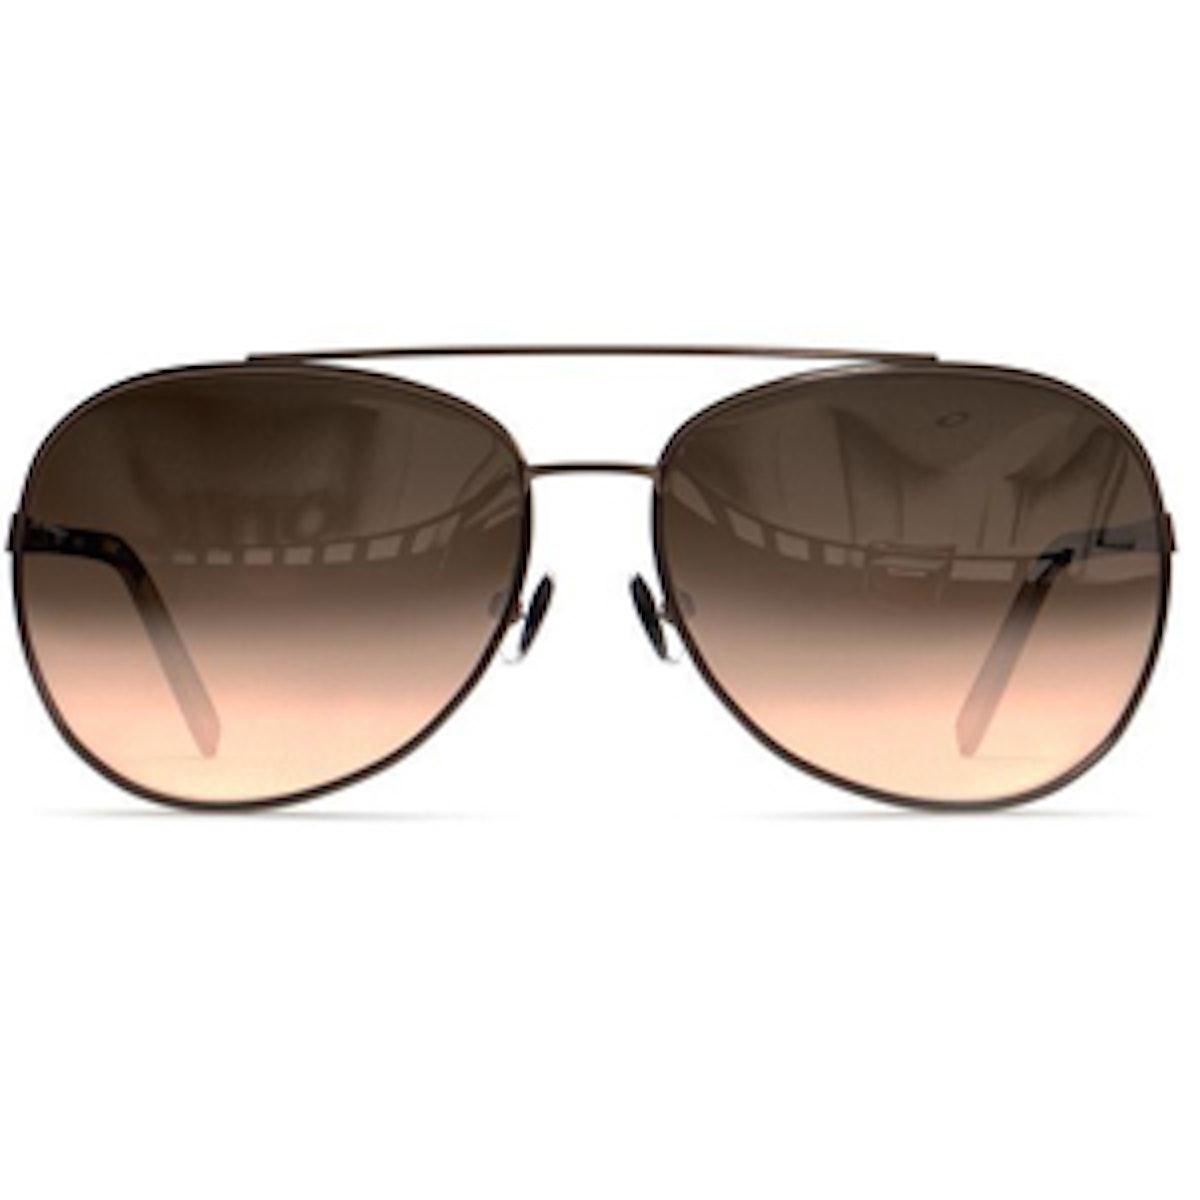 Southport Sunglasses